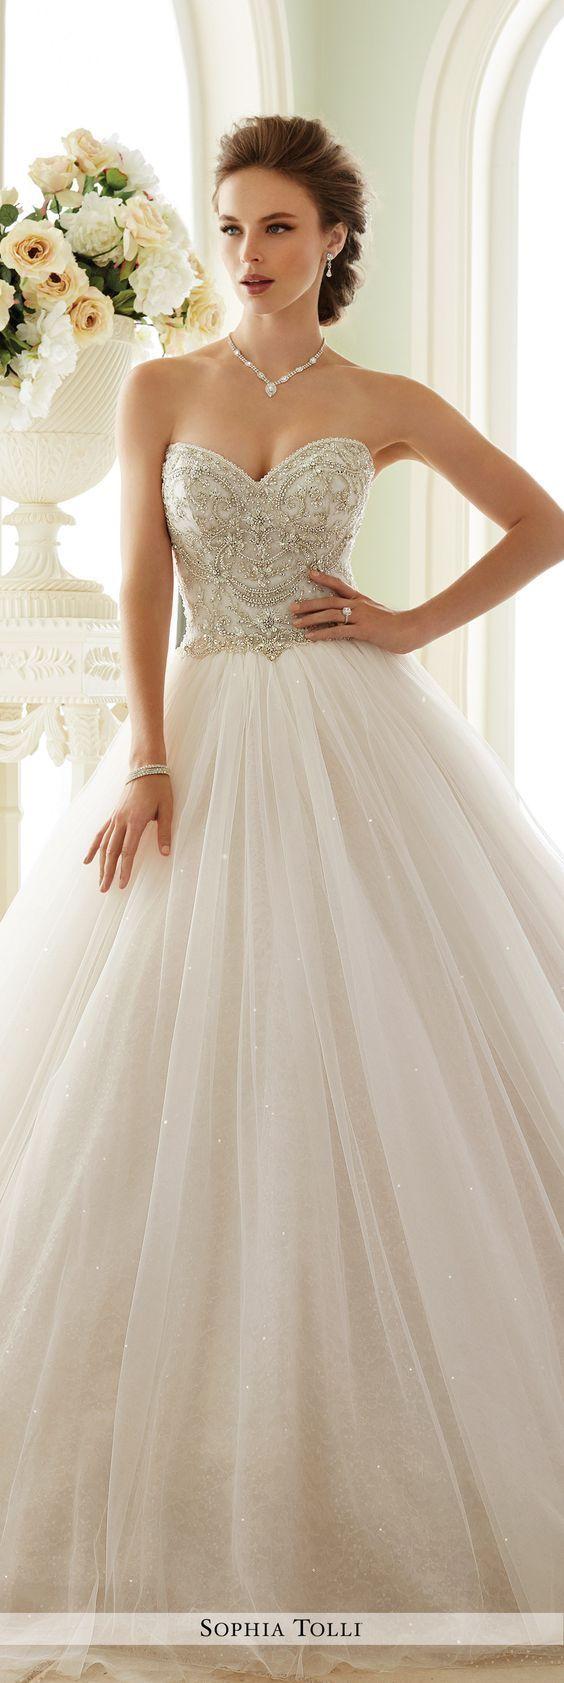 40 Sweetheart Wedding Dresses That Will Take Your Breath Away - Deer Pearl Flowers / http://www.deerpearlflowers.com/sweetheart-wedding-dresses/